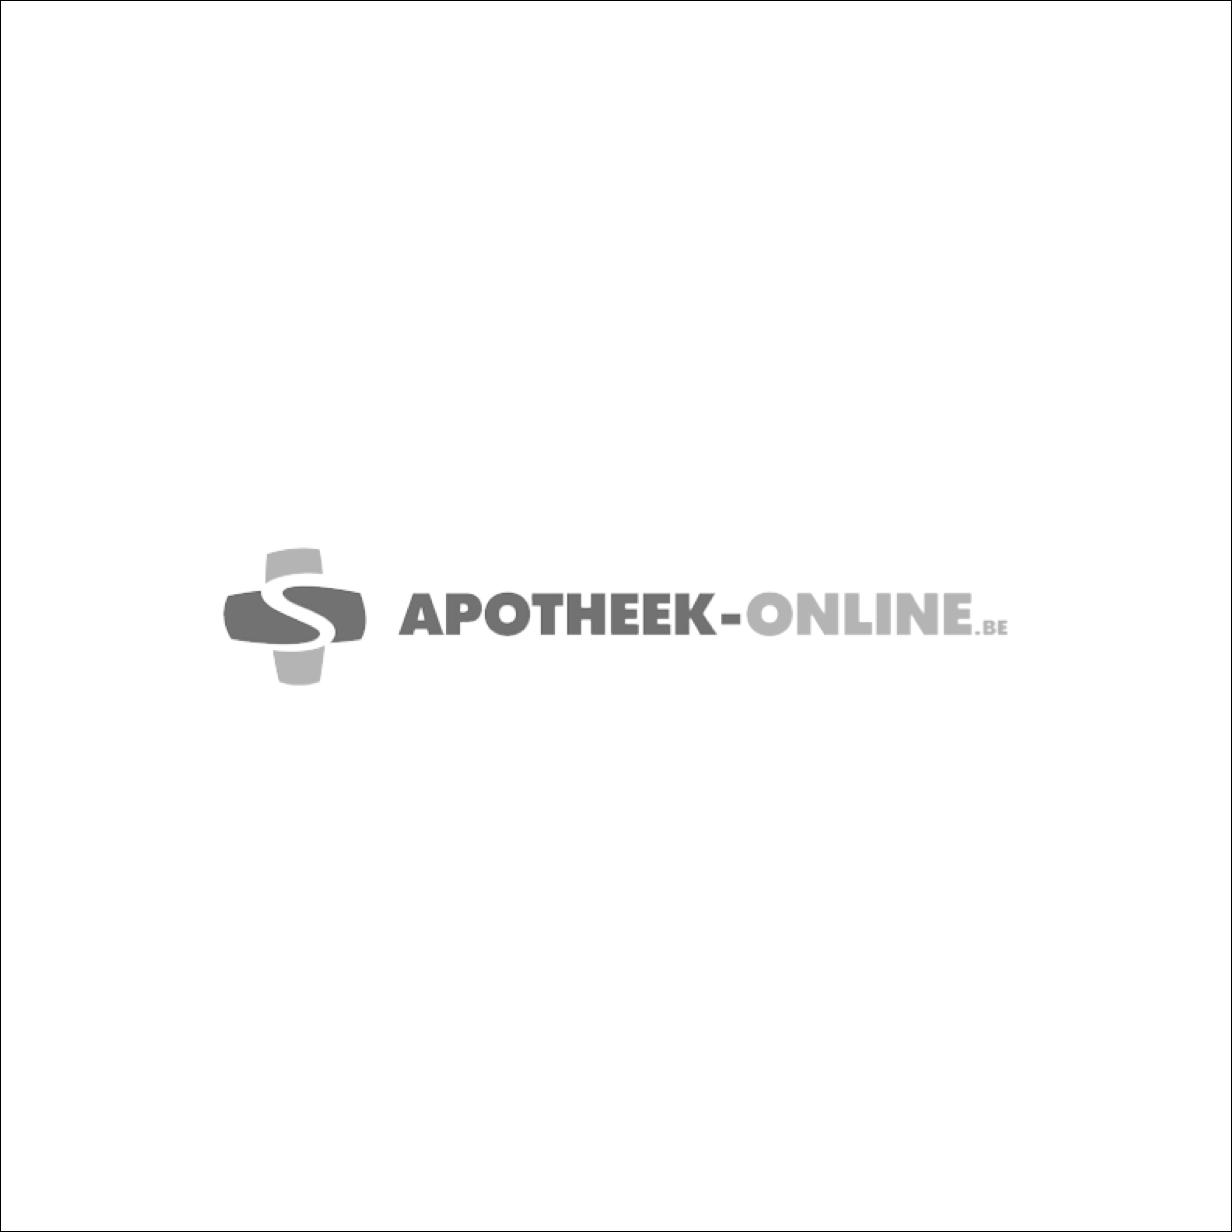 Sterop Vit B12 1mg 1ml 100 Amp